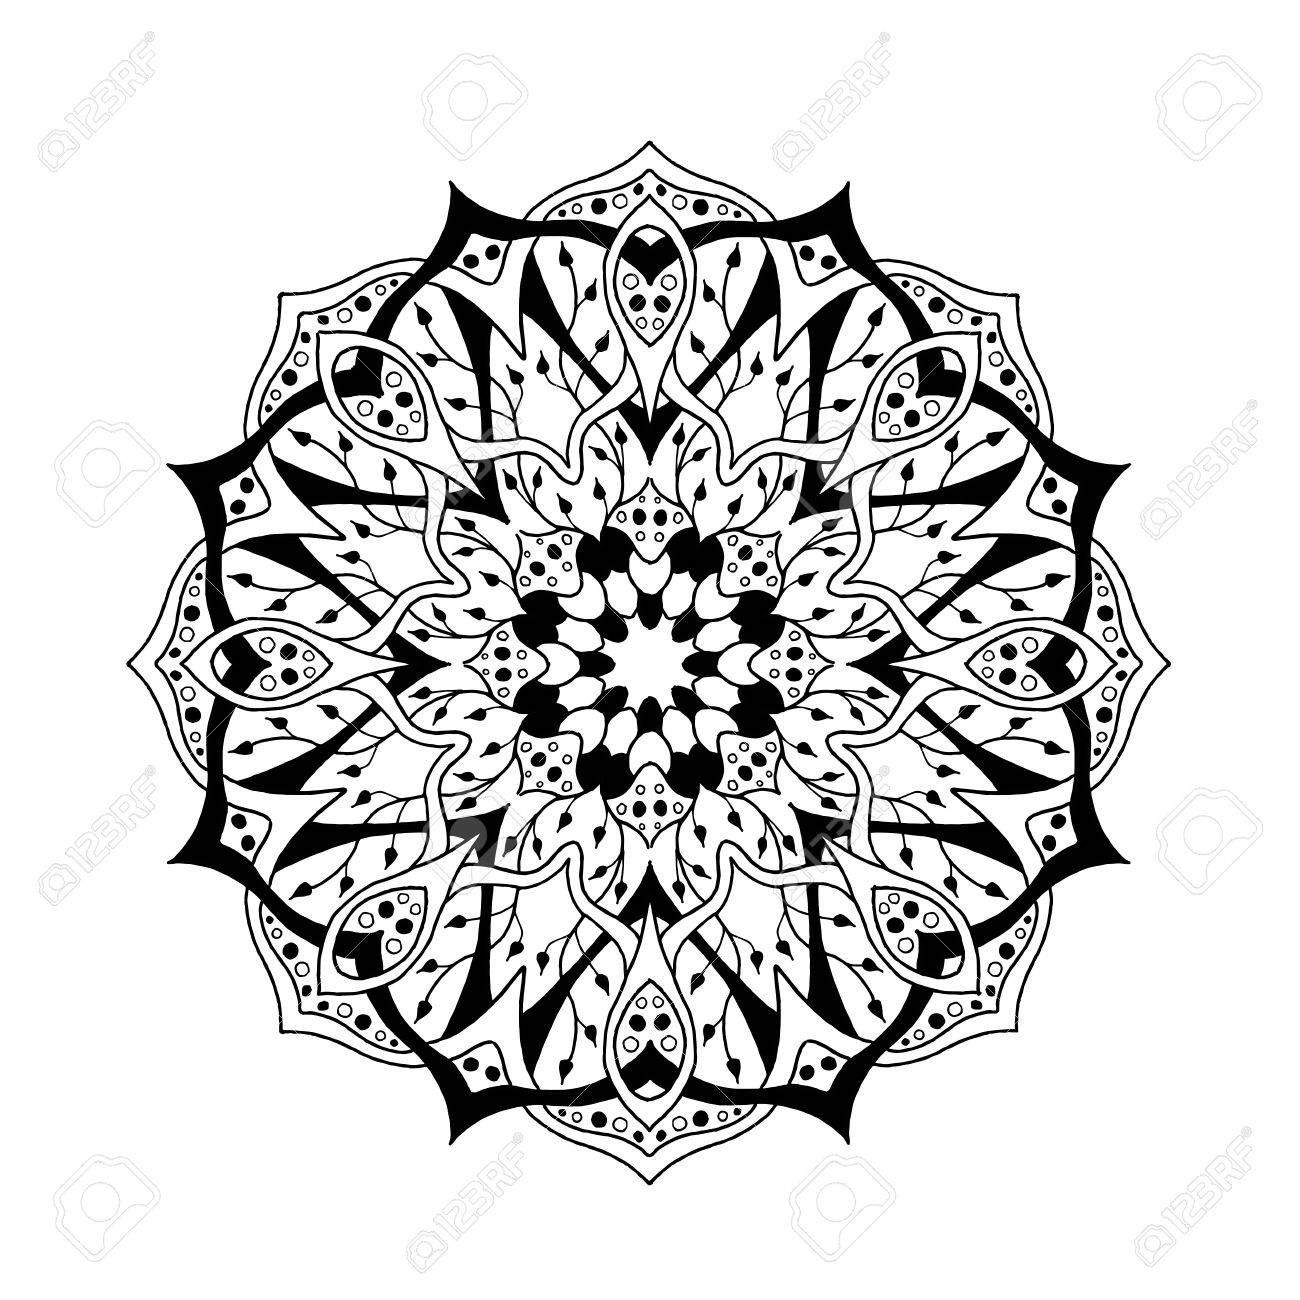 Mandala. Floral Ethnic Abstract Decorative Elements. Hand Drawn ...